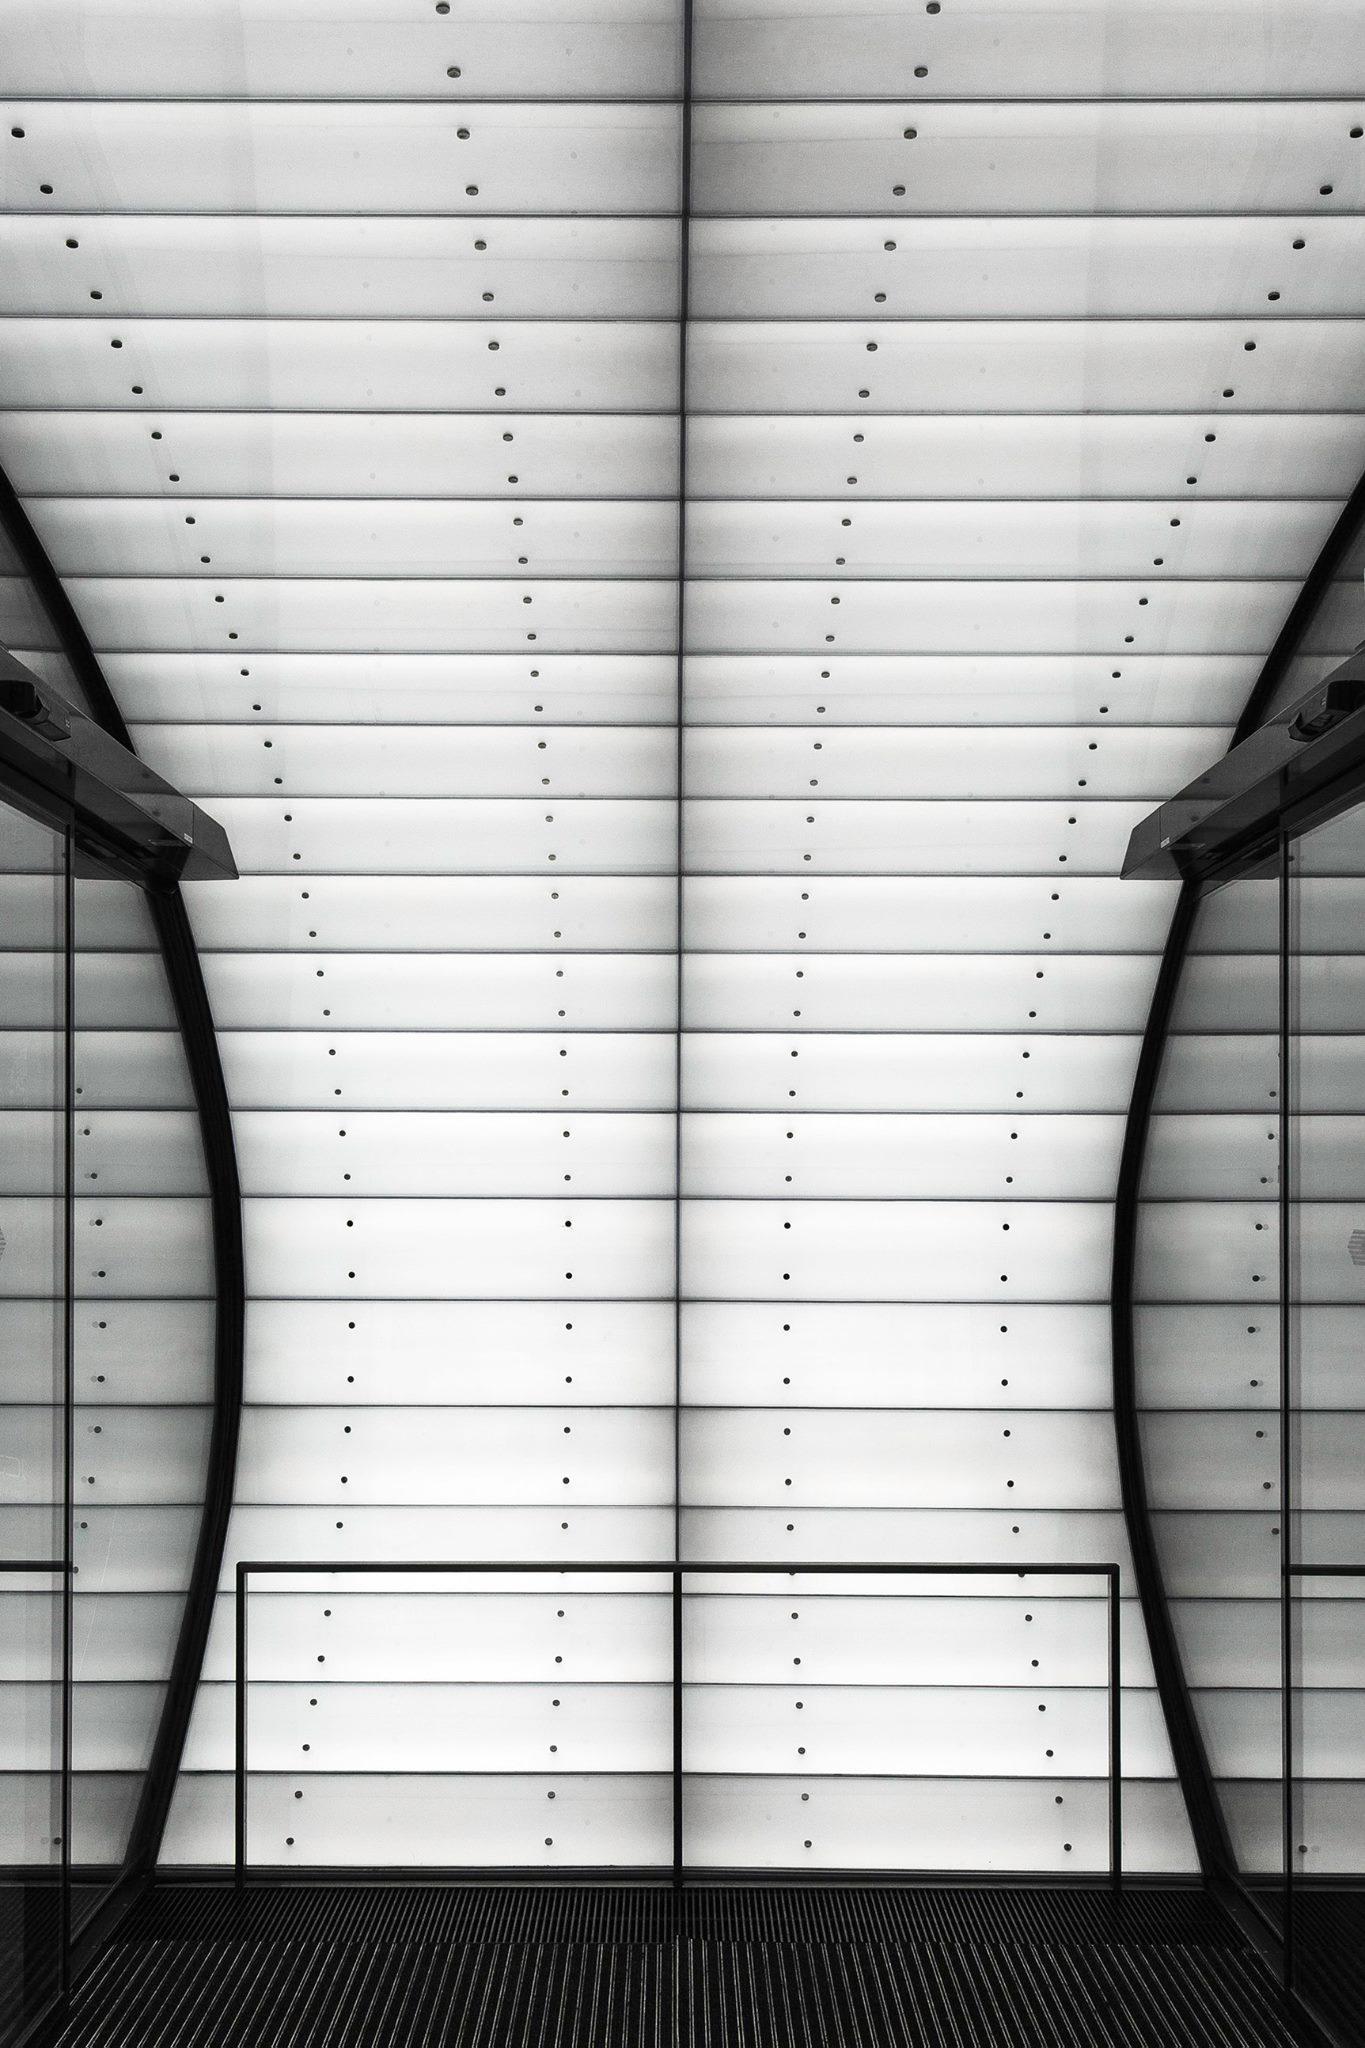 kevin-krautgartner-architecture-photography-05